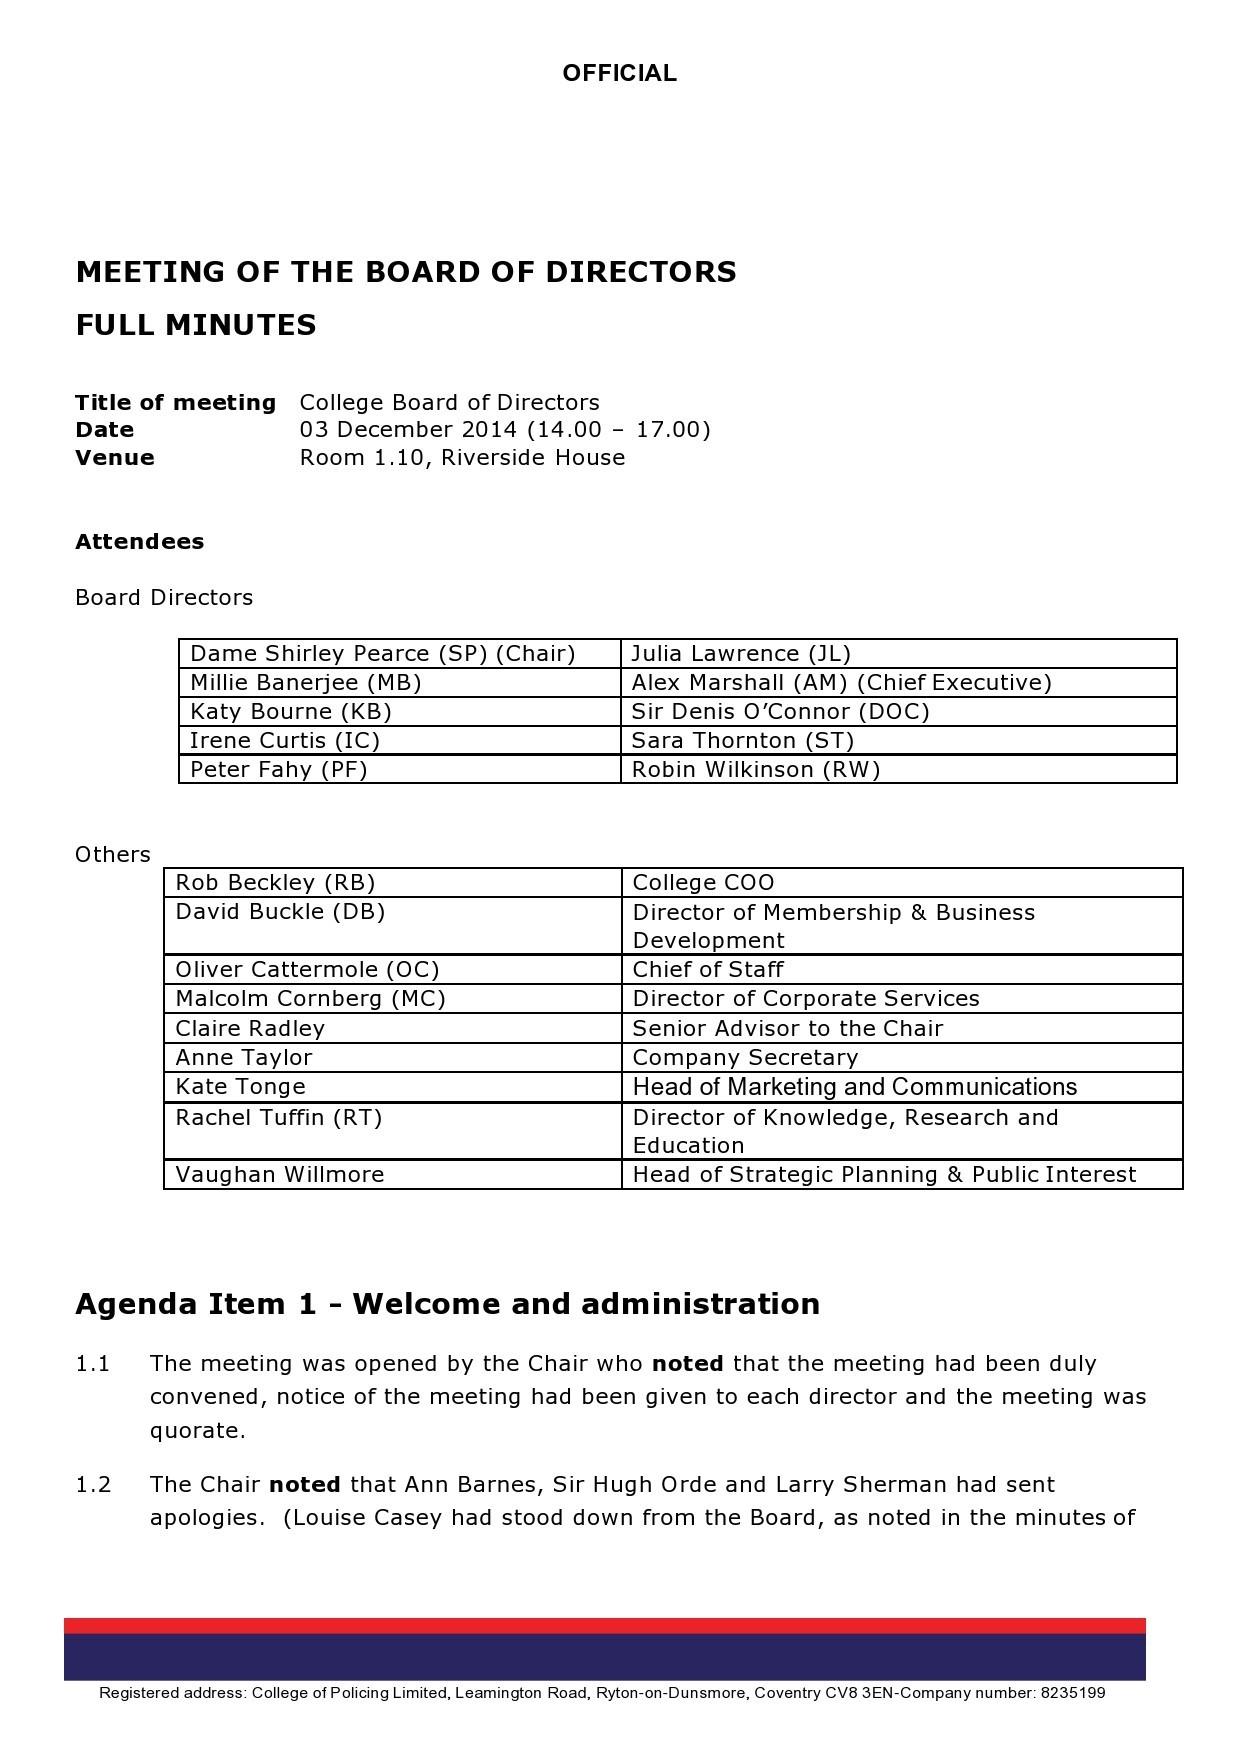 Free board meeting agenda 08